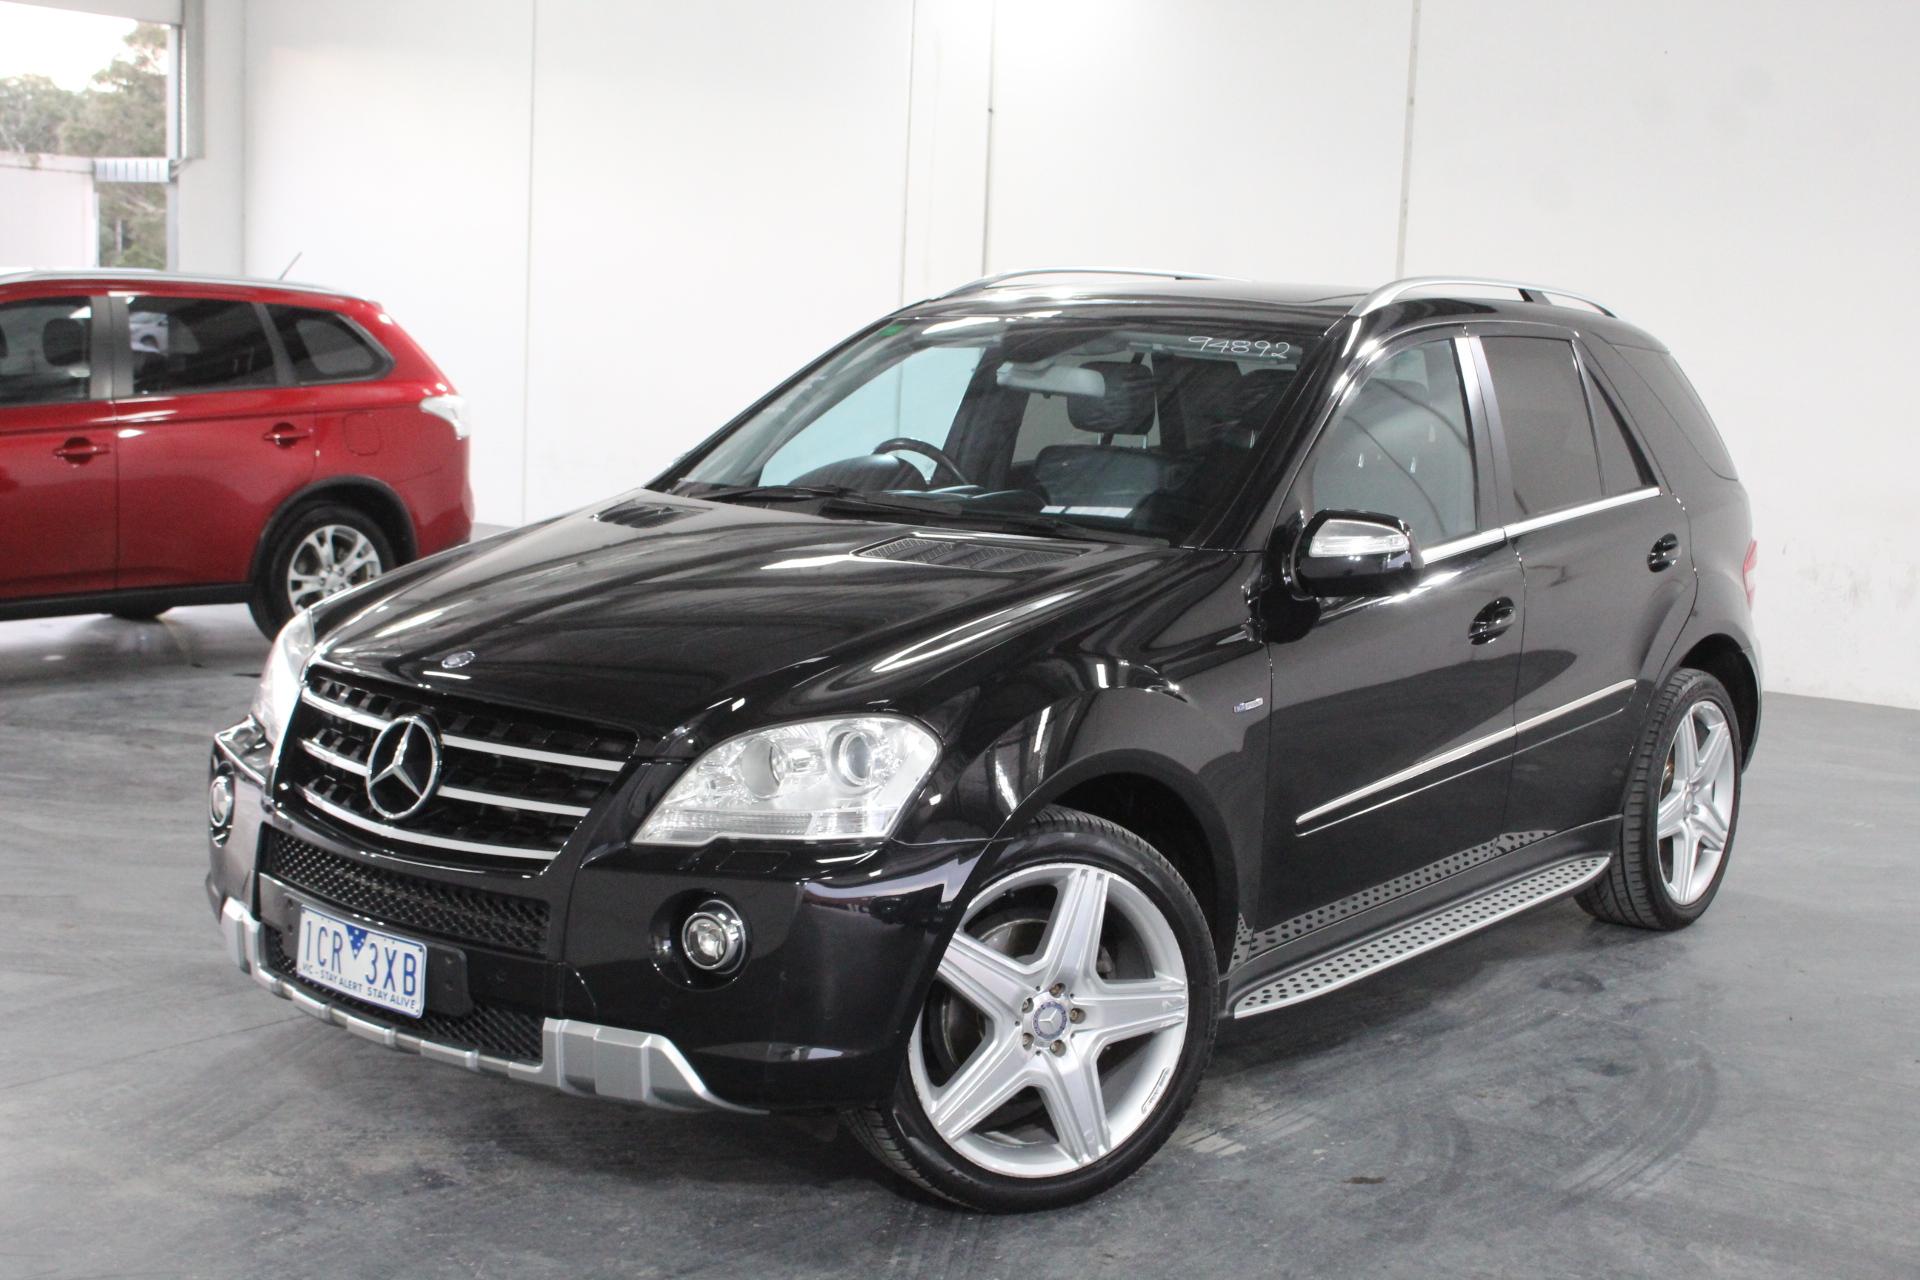 2010 Mercedes Benz ML 300 CDI (4x4) W164 Turbo Diesel Automatic Wagon